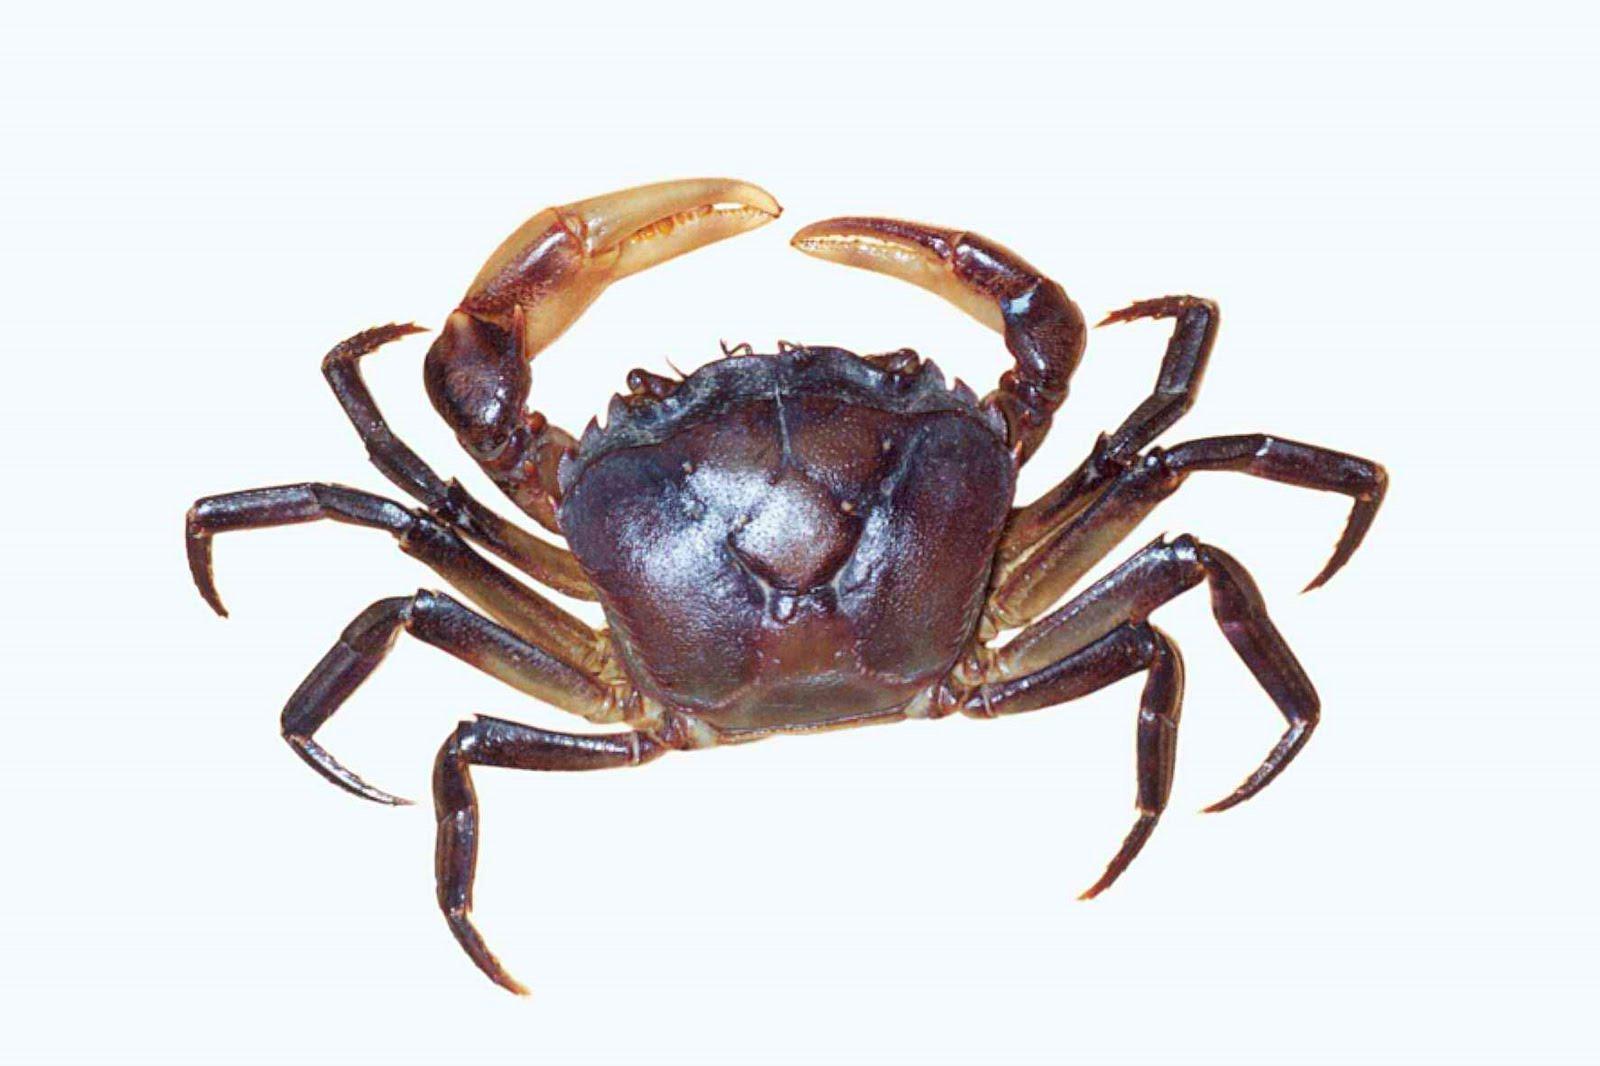 Crabs Pictures Aquatic Sea Animals cini clips